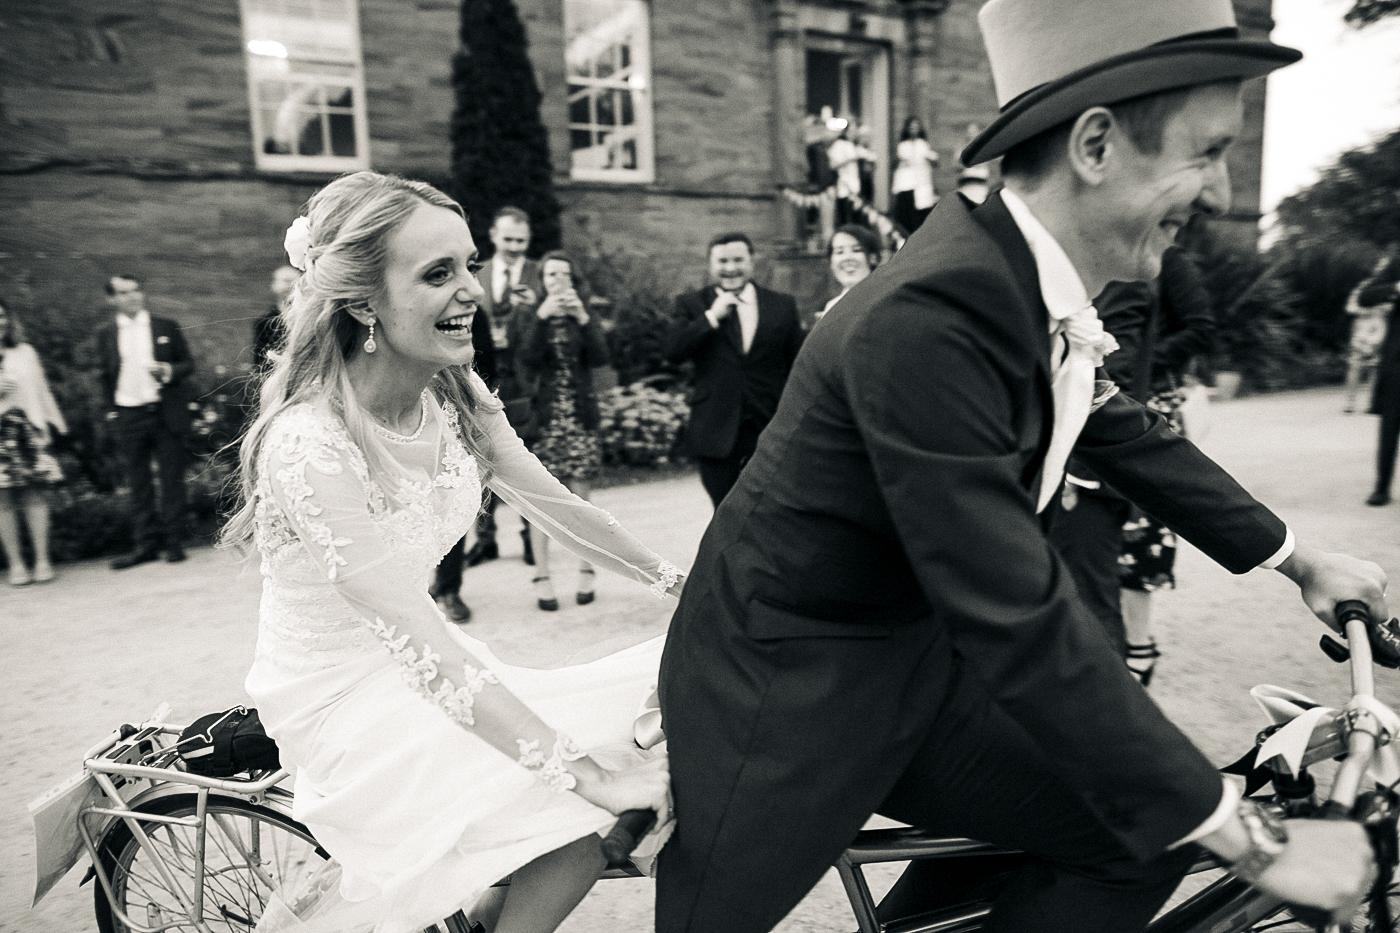 creative-wedding-photography-teesside-north-east-yorkshire-21.jpg